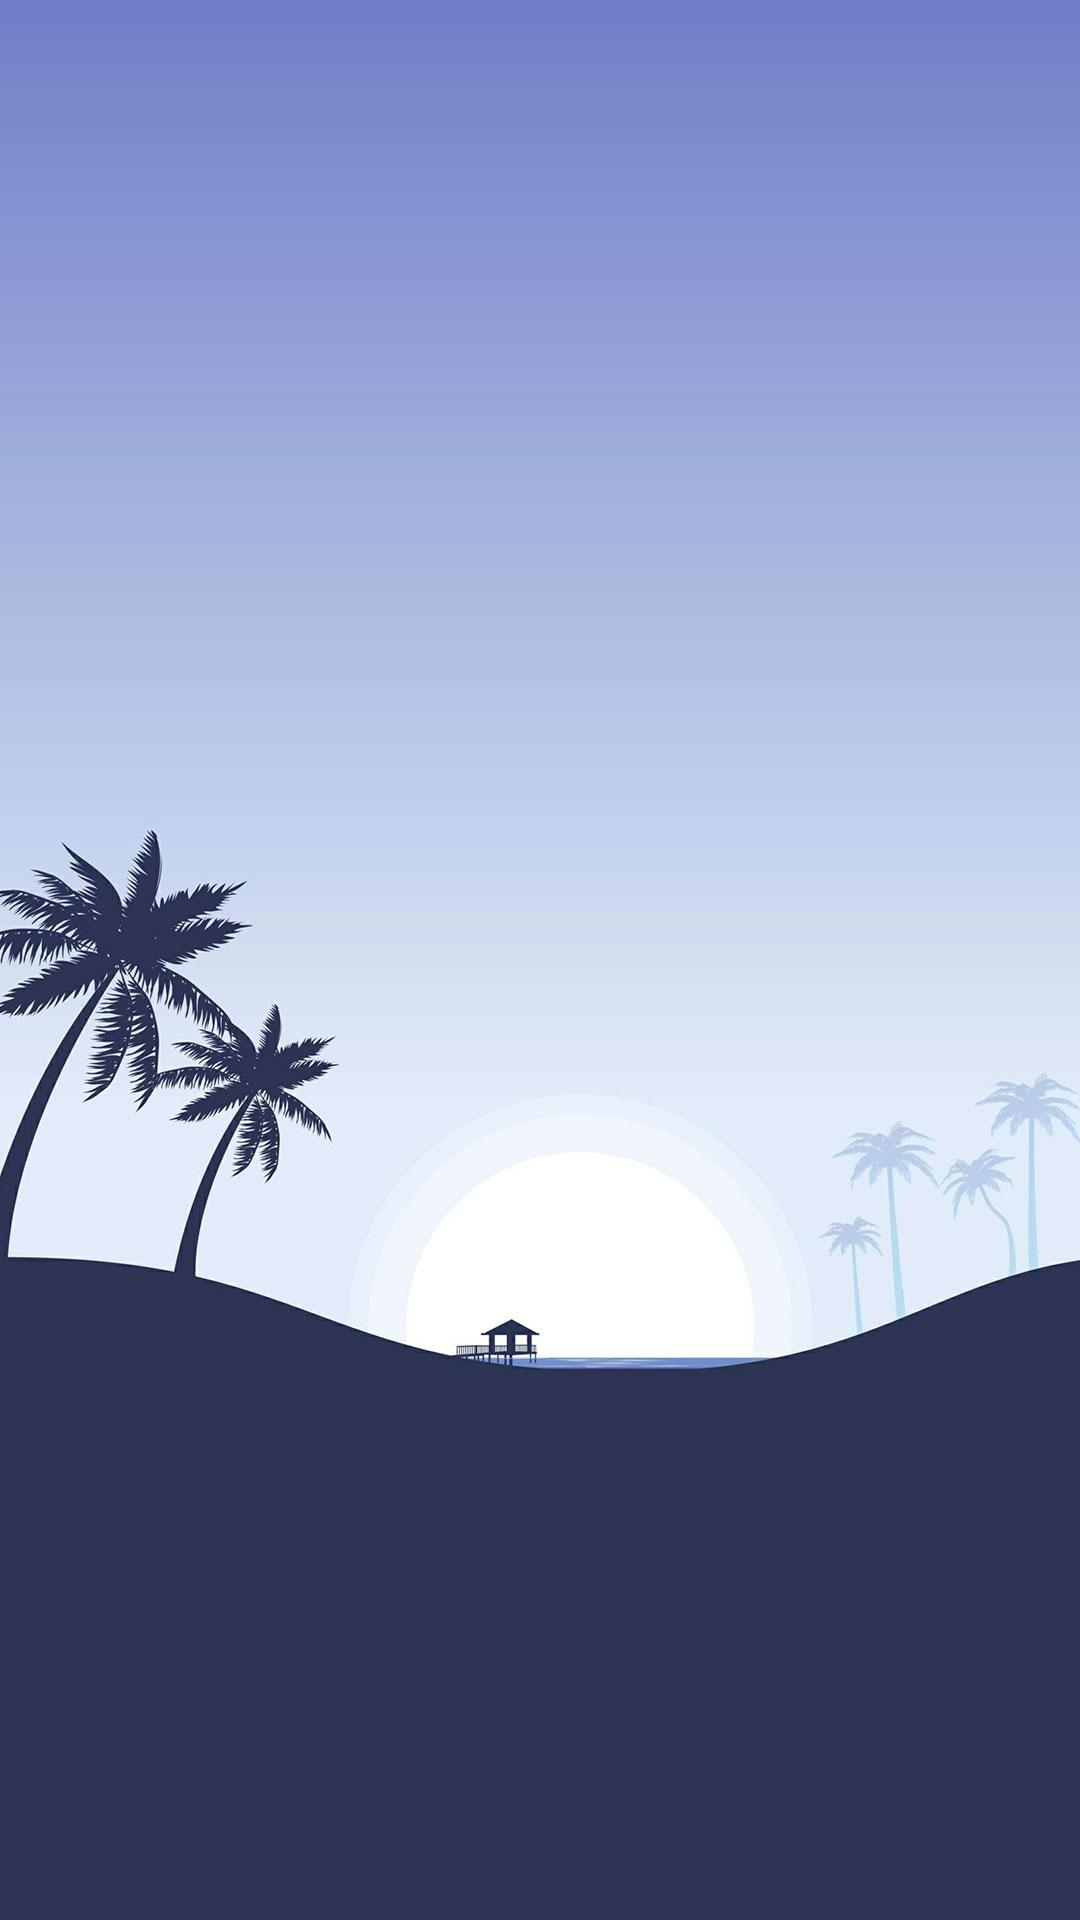 iPhone wallpaper illustration1 Illustration